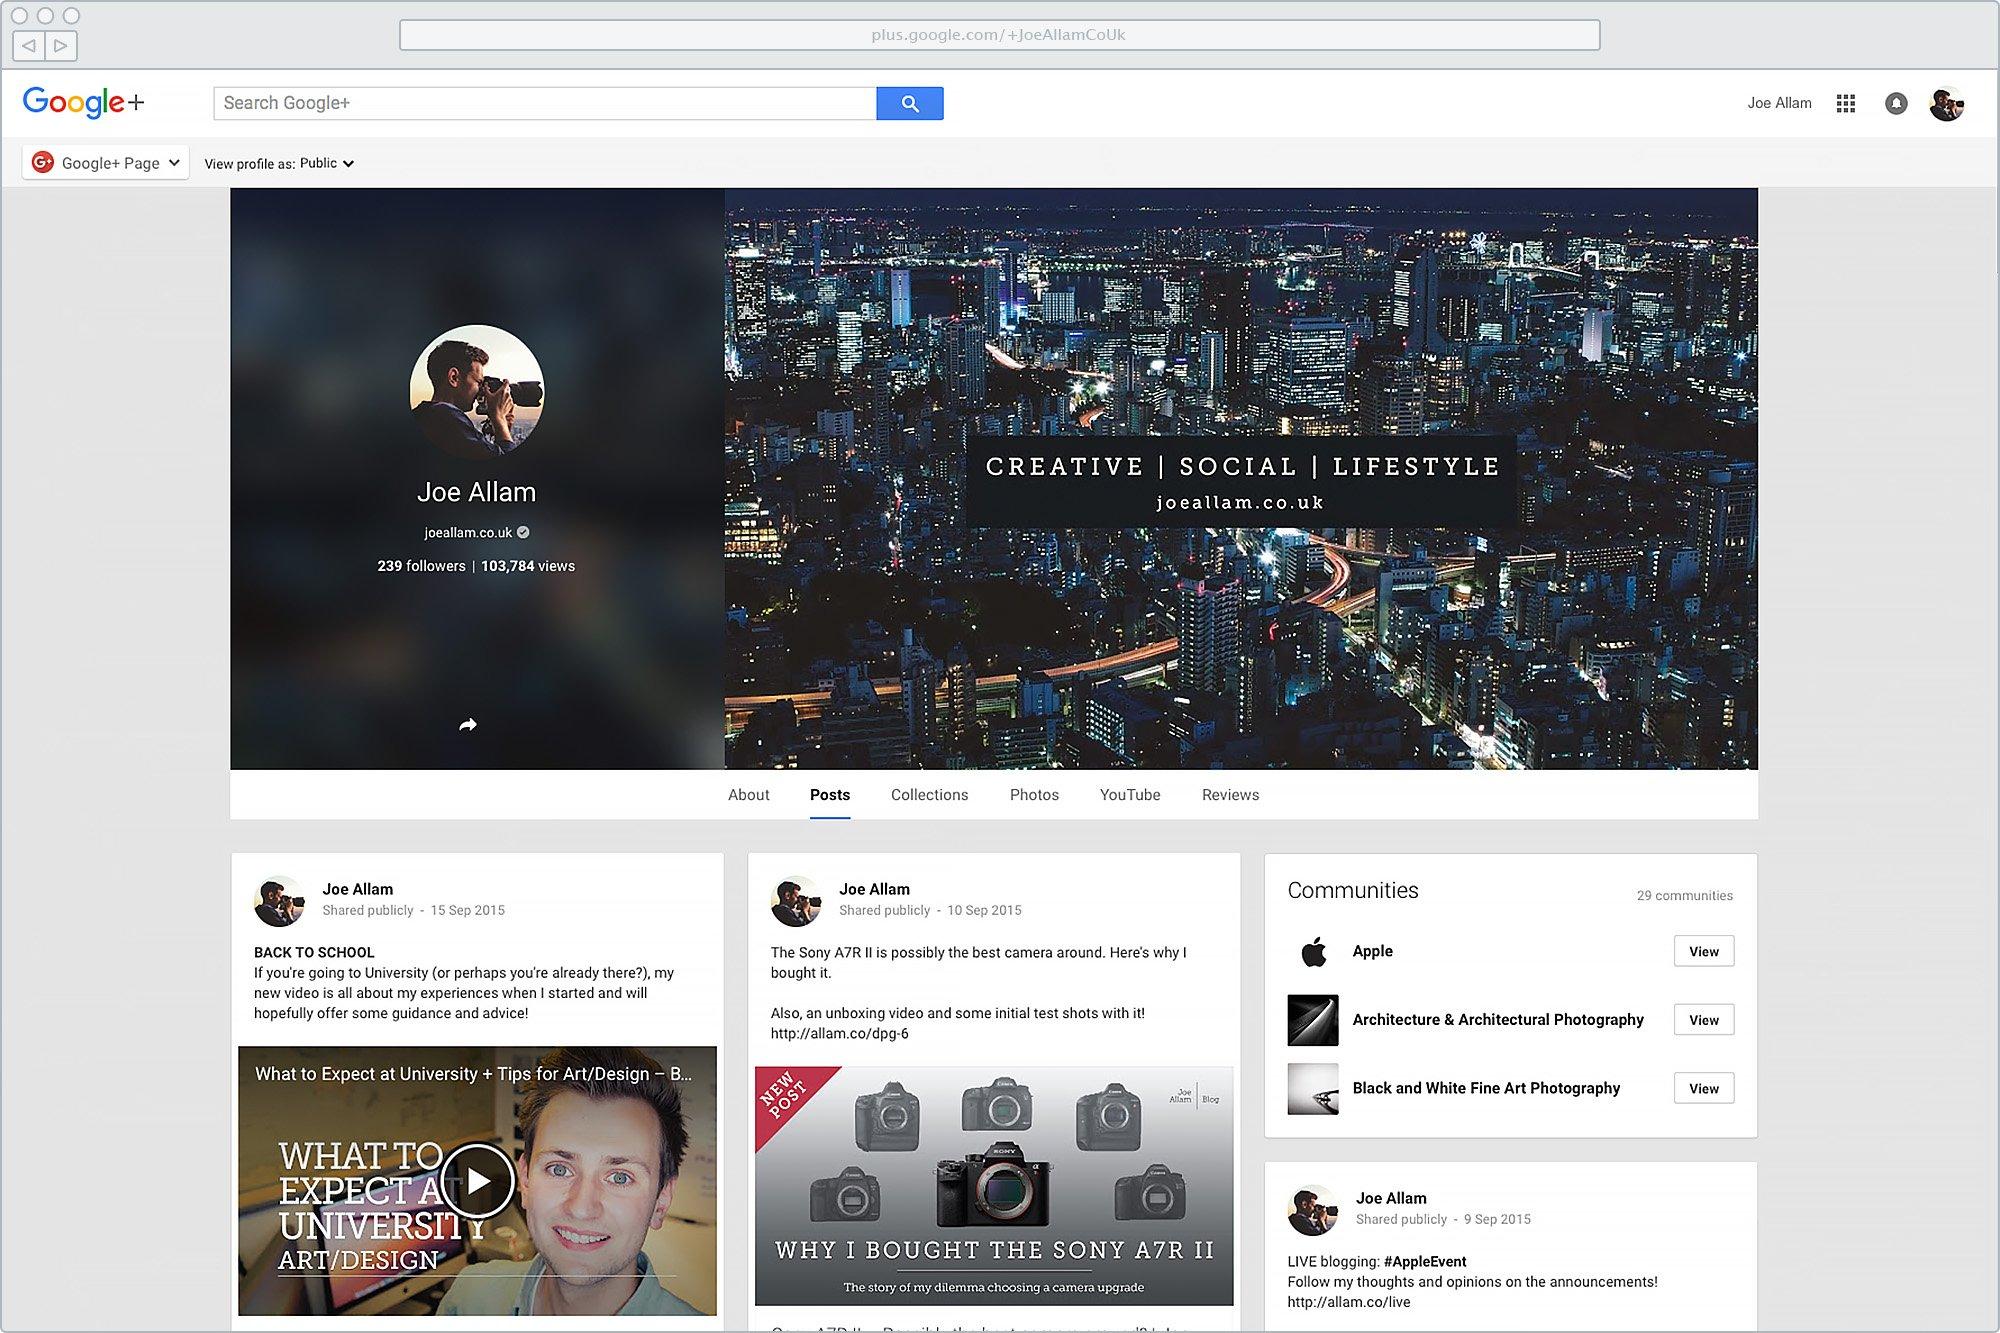 Old Google+ Branding